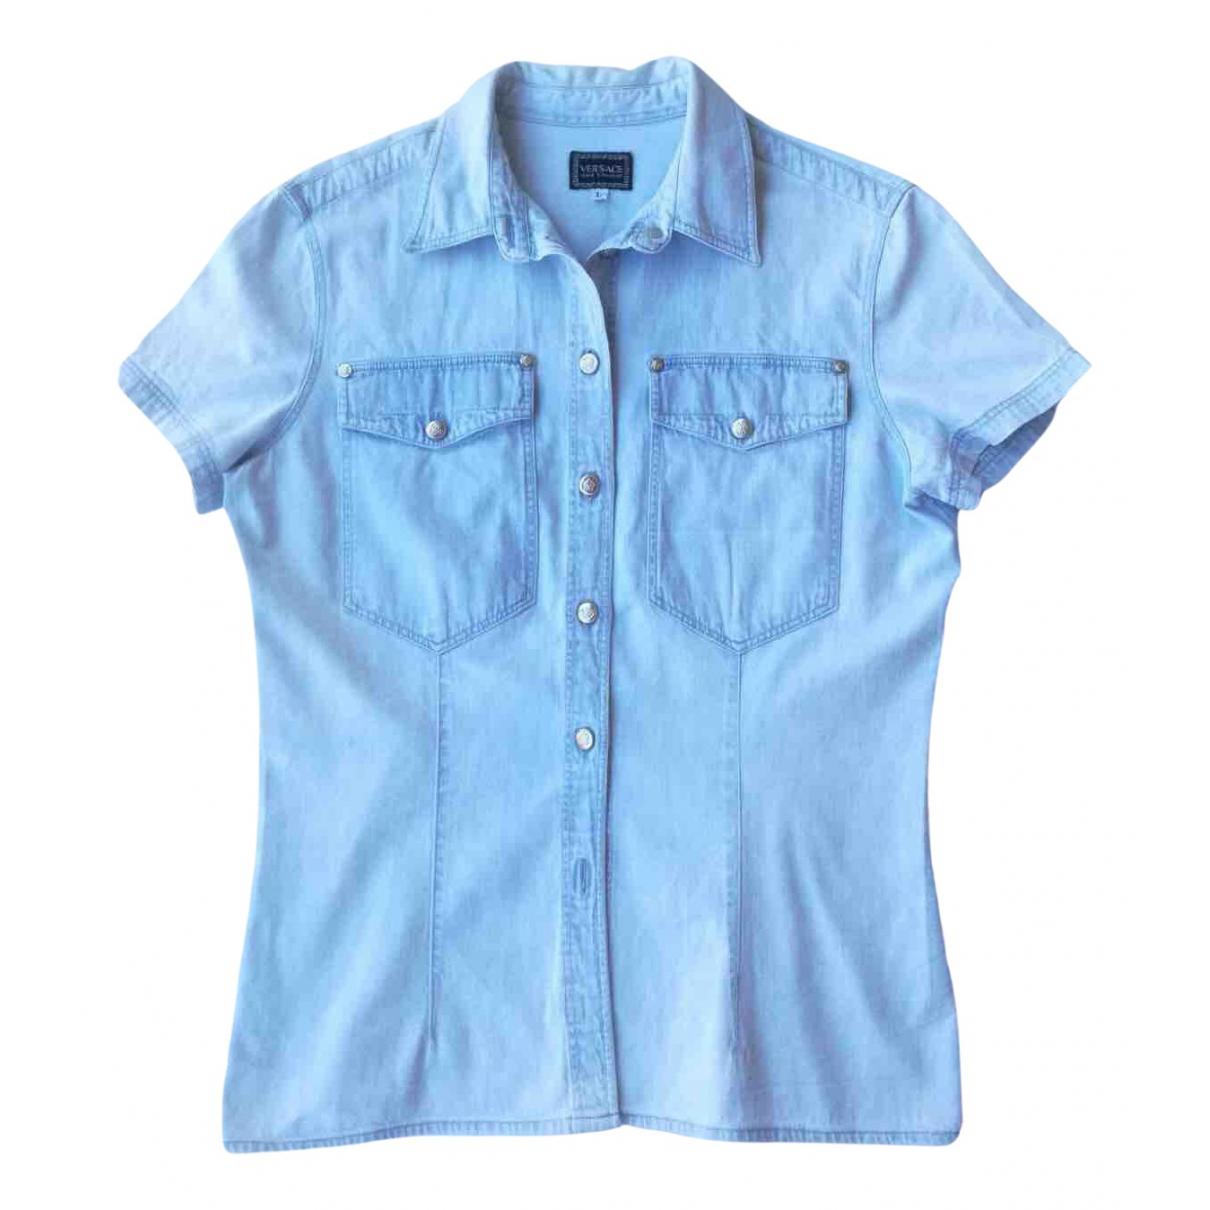 Versace Jeans N Blue Denim - Jeans  top for Women L International